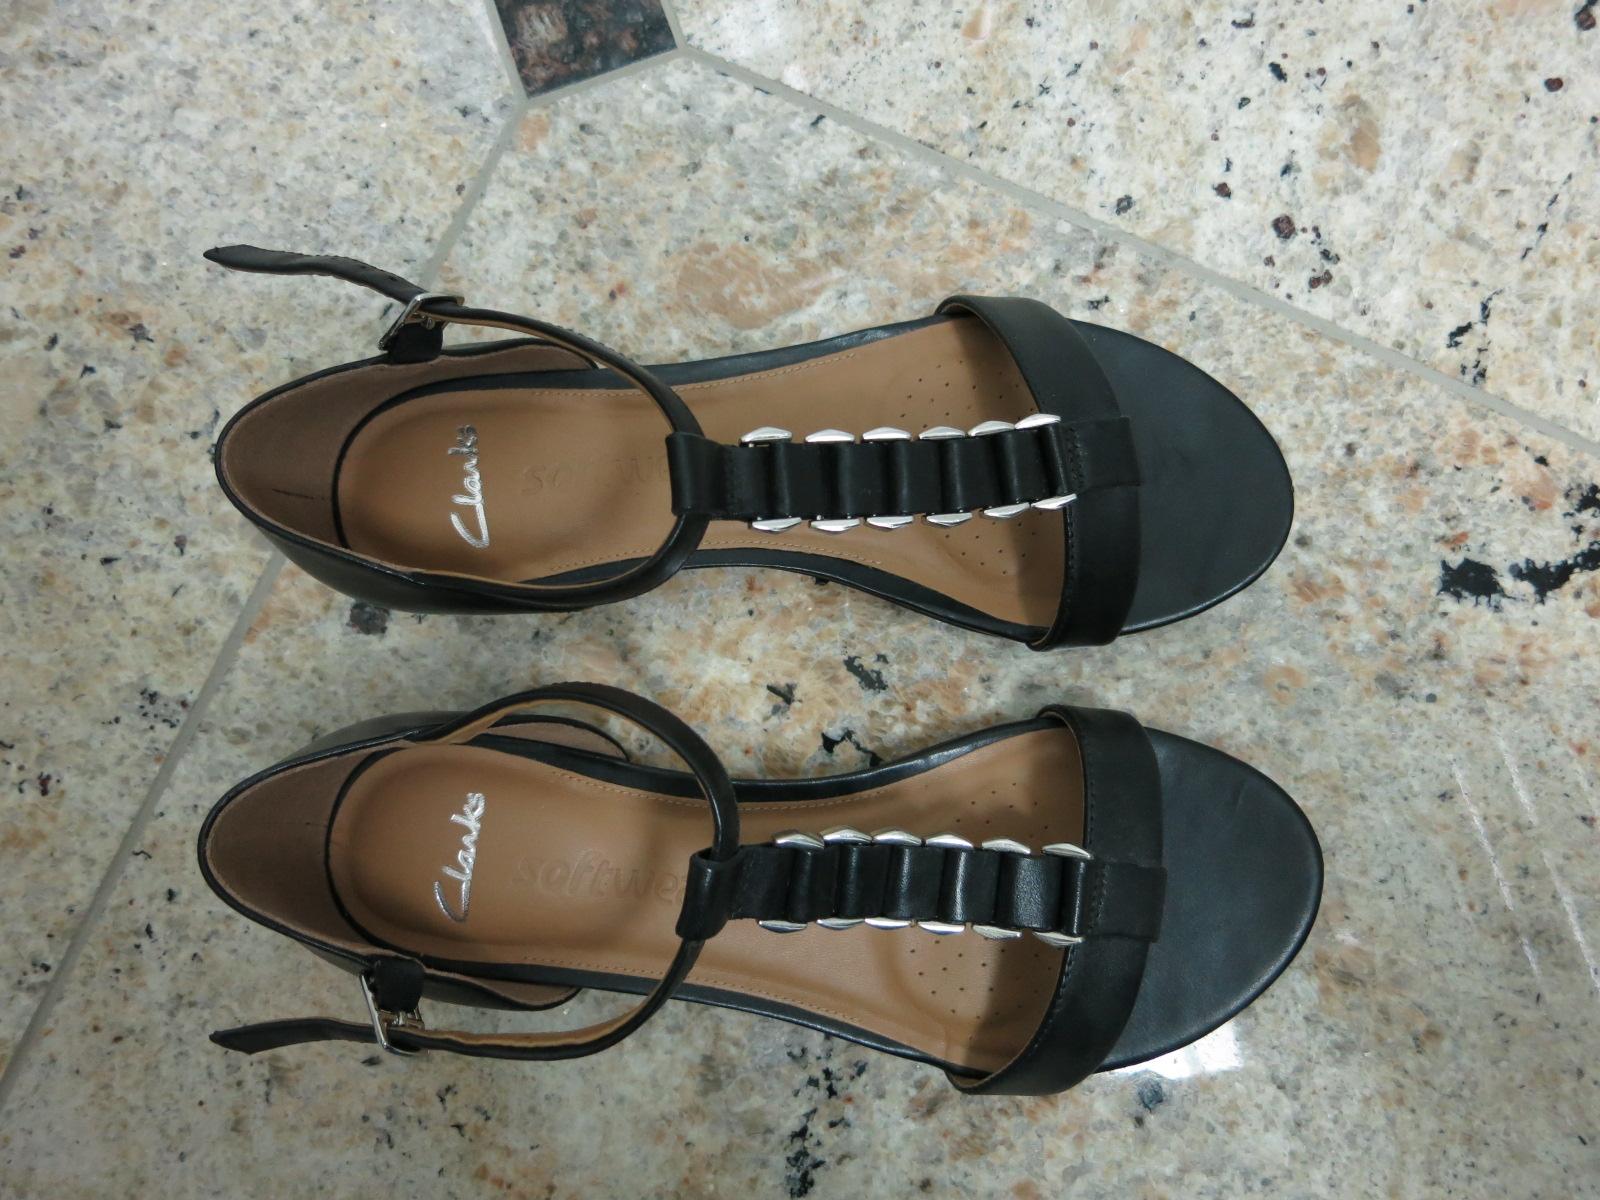 a627faeba897 Clarks Studio Beat Czarne sandały skóra nat. 37 - 7439558899 ...